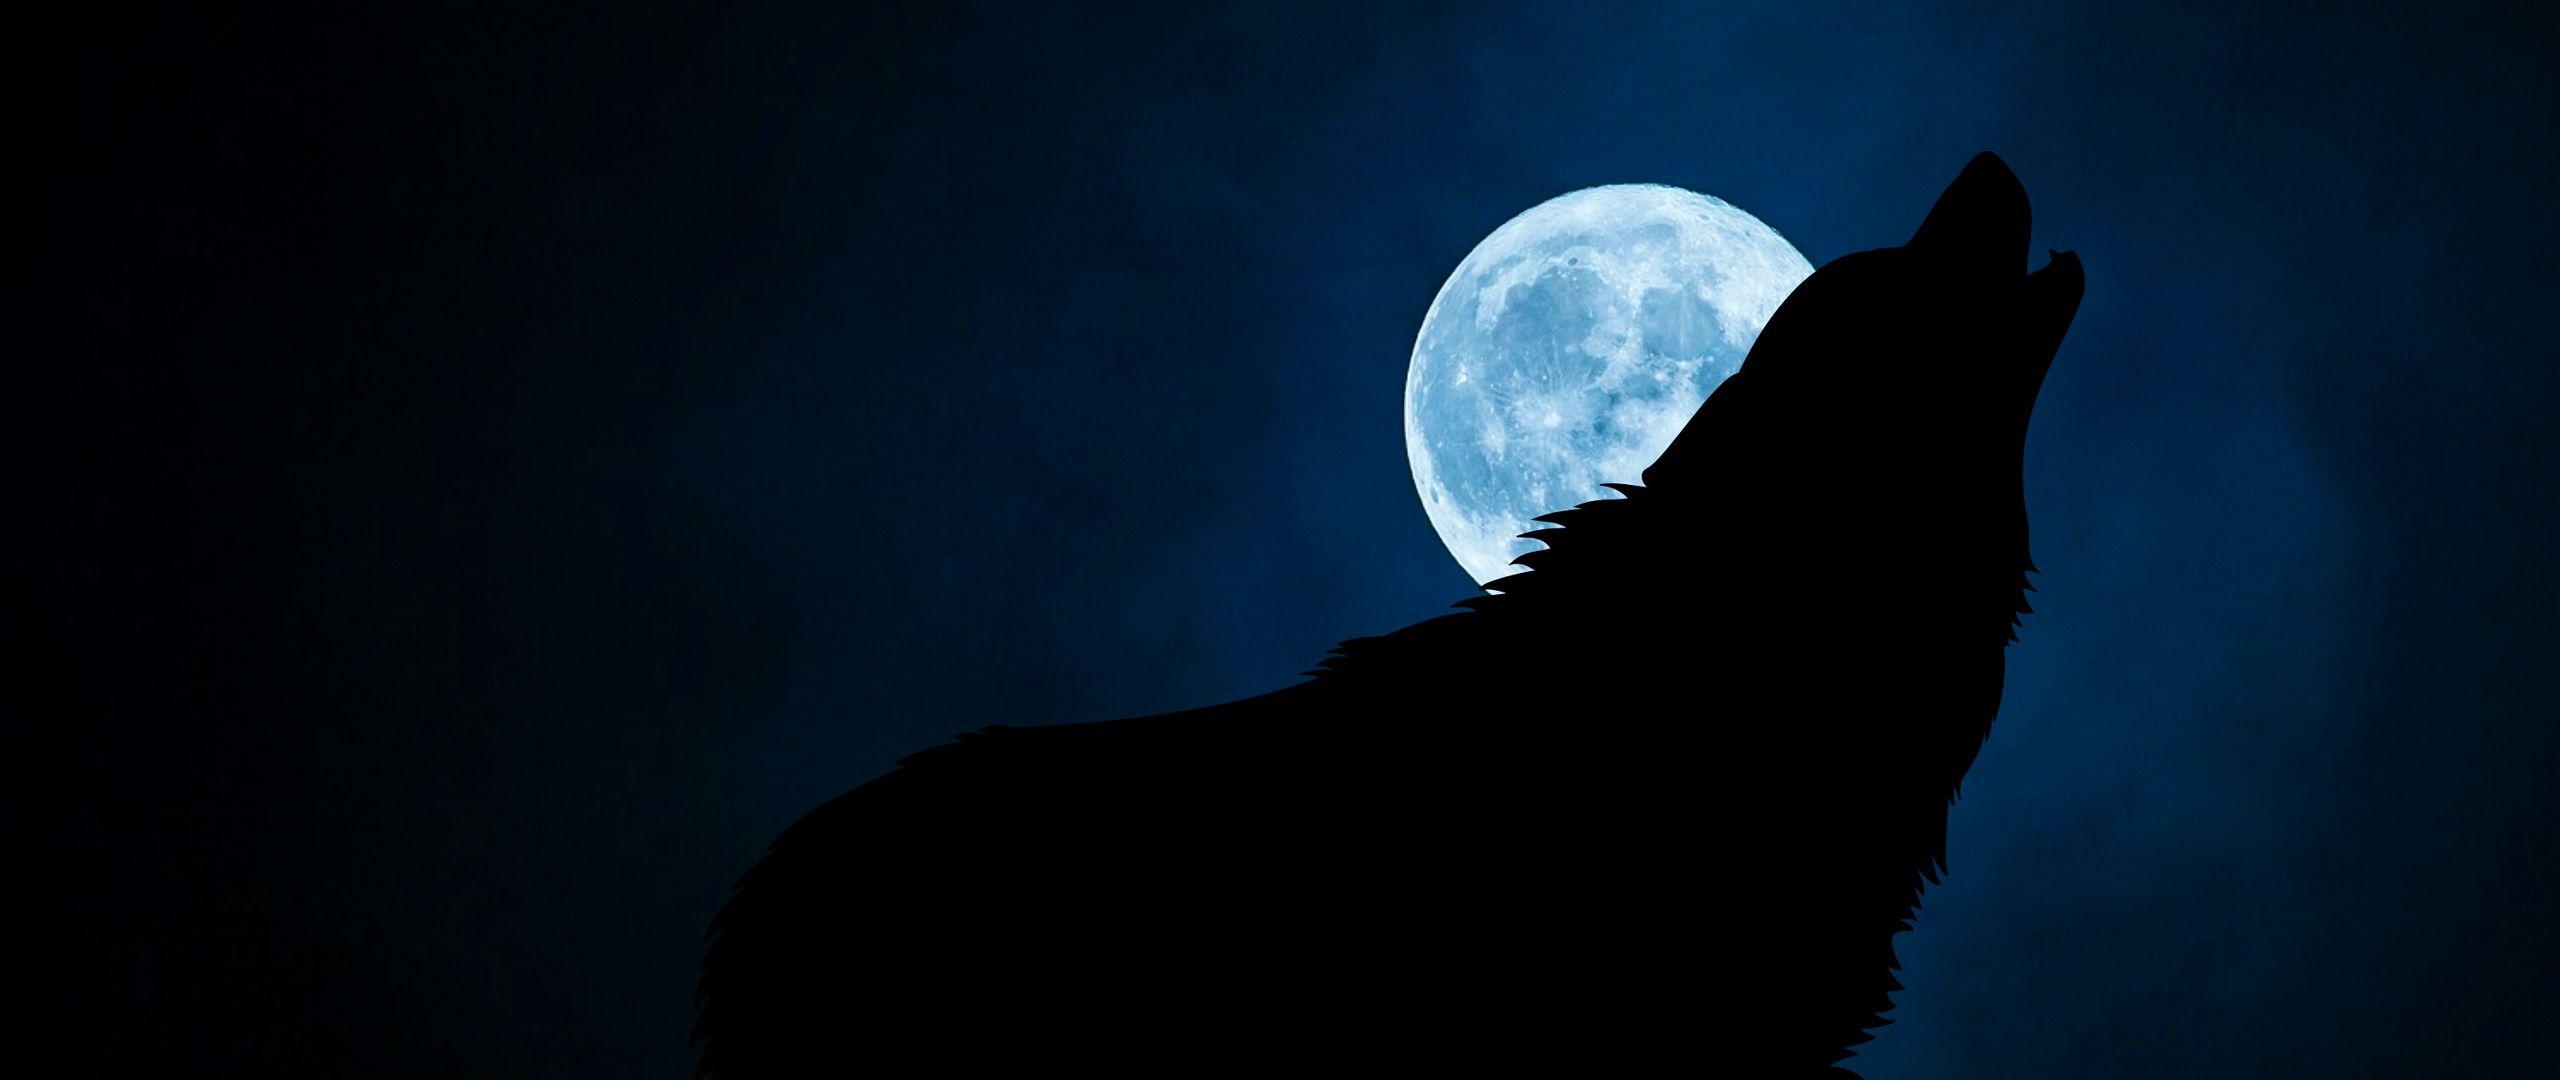 2560x1080 Wallpaper wolf, silhouette, moon, night